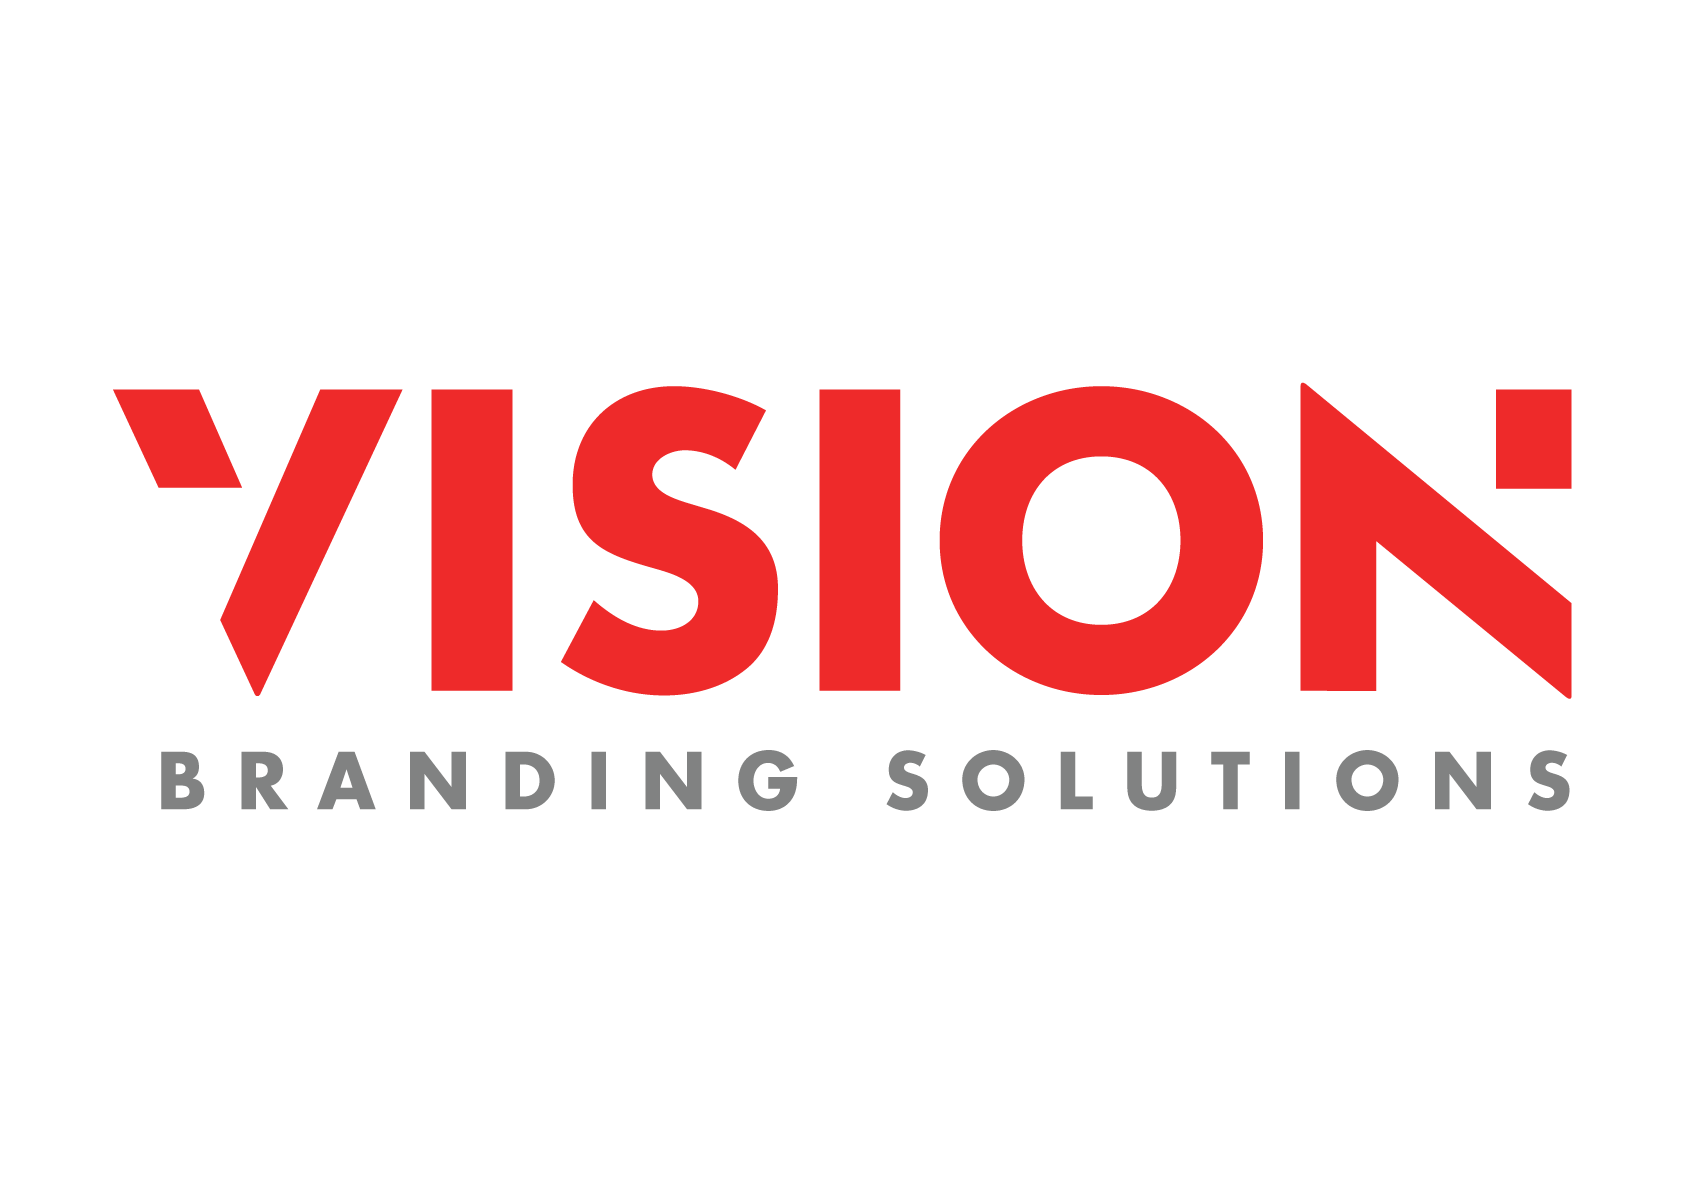 VISION-BRANDING_LOGO.png